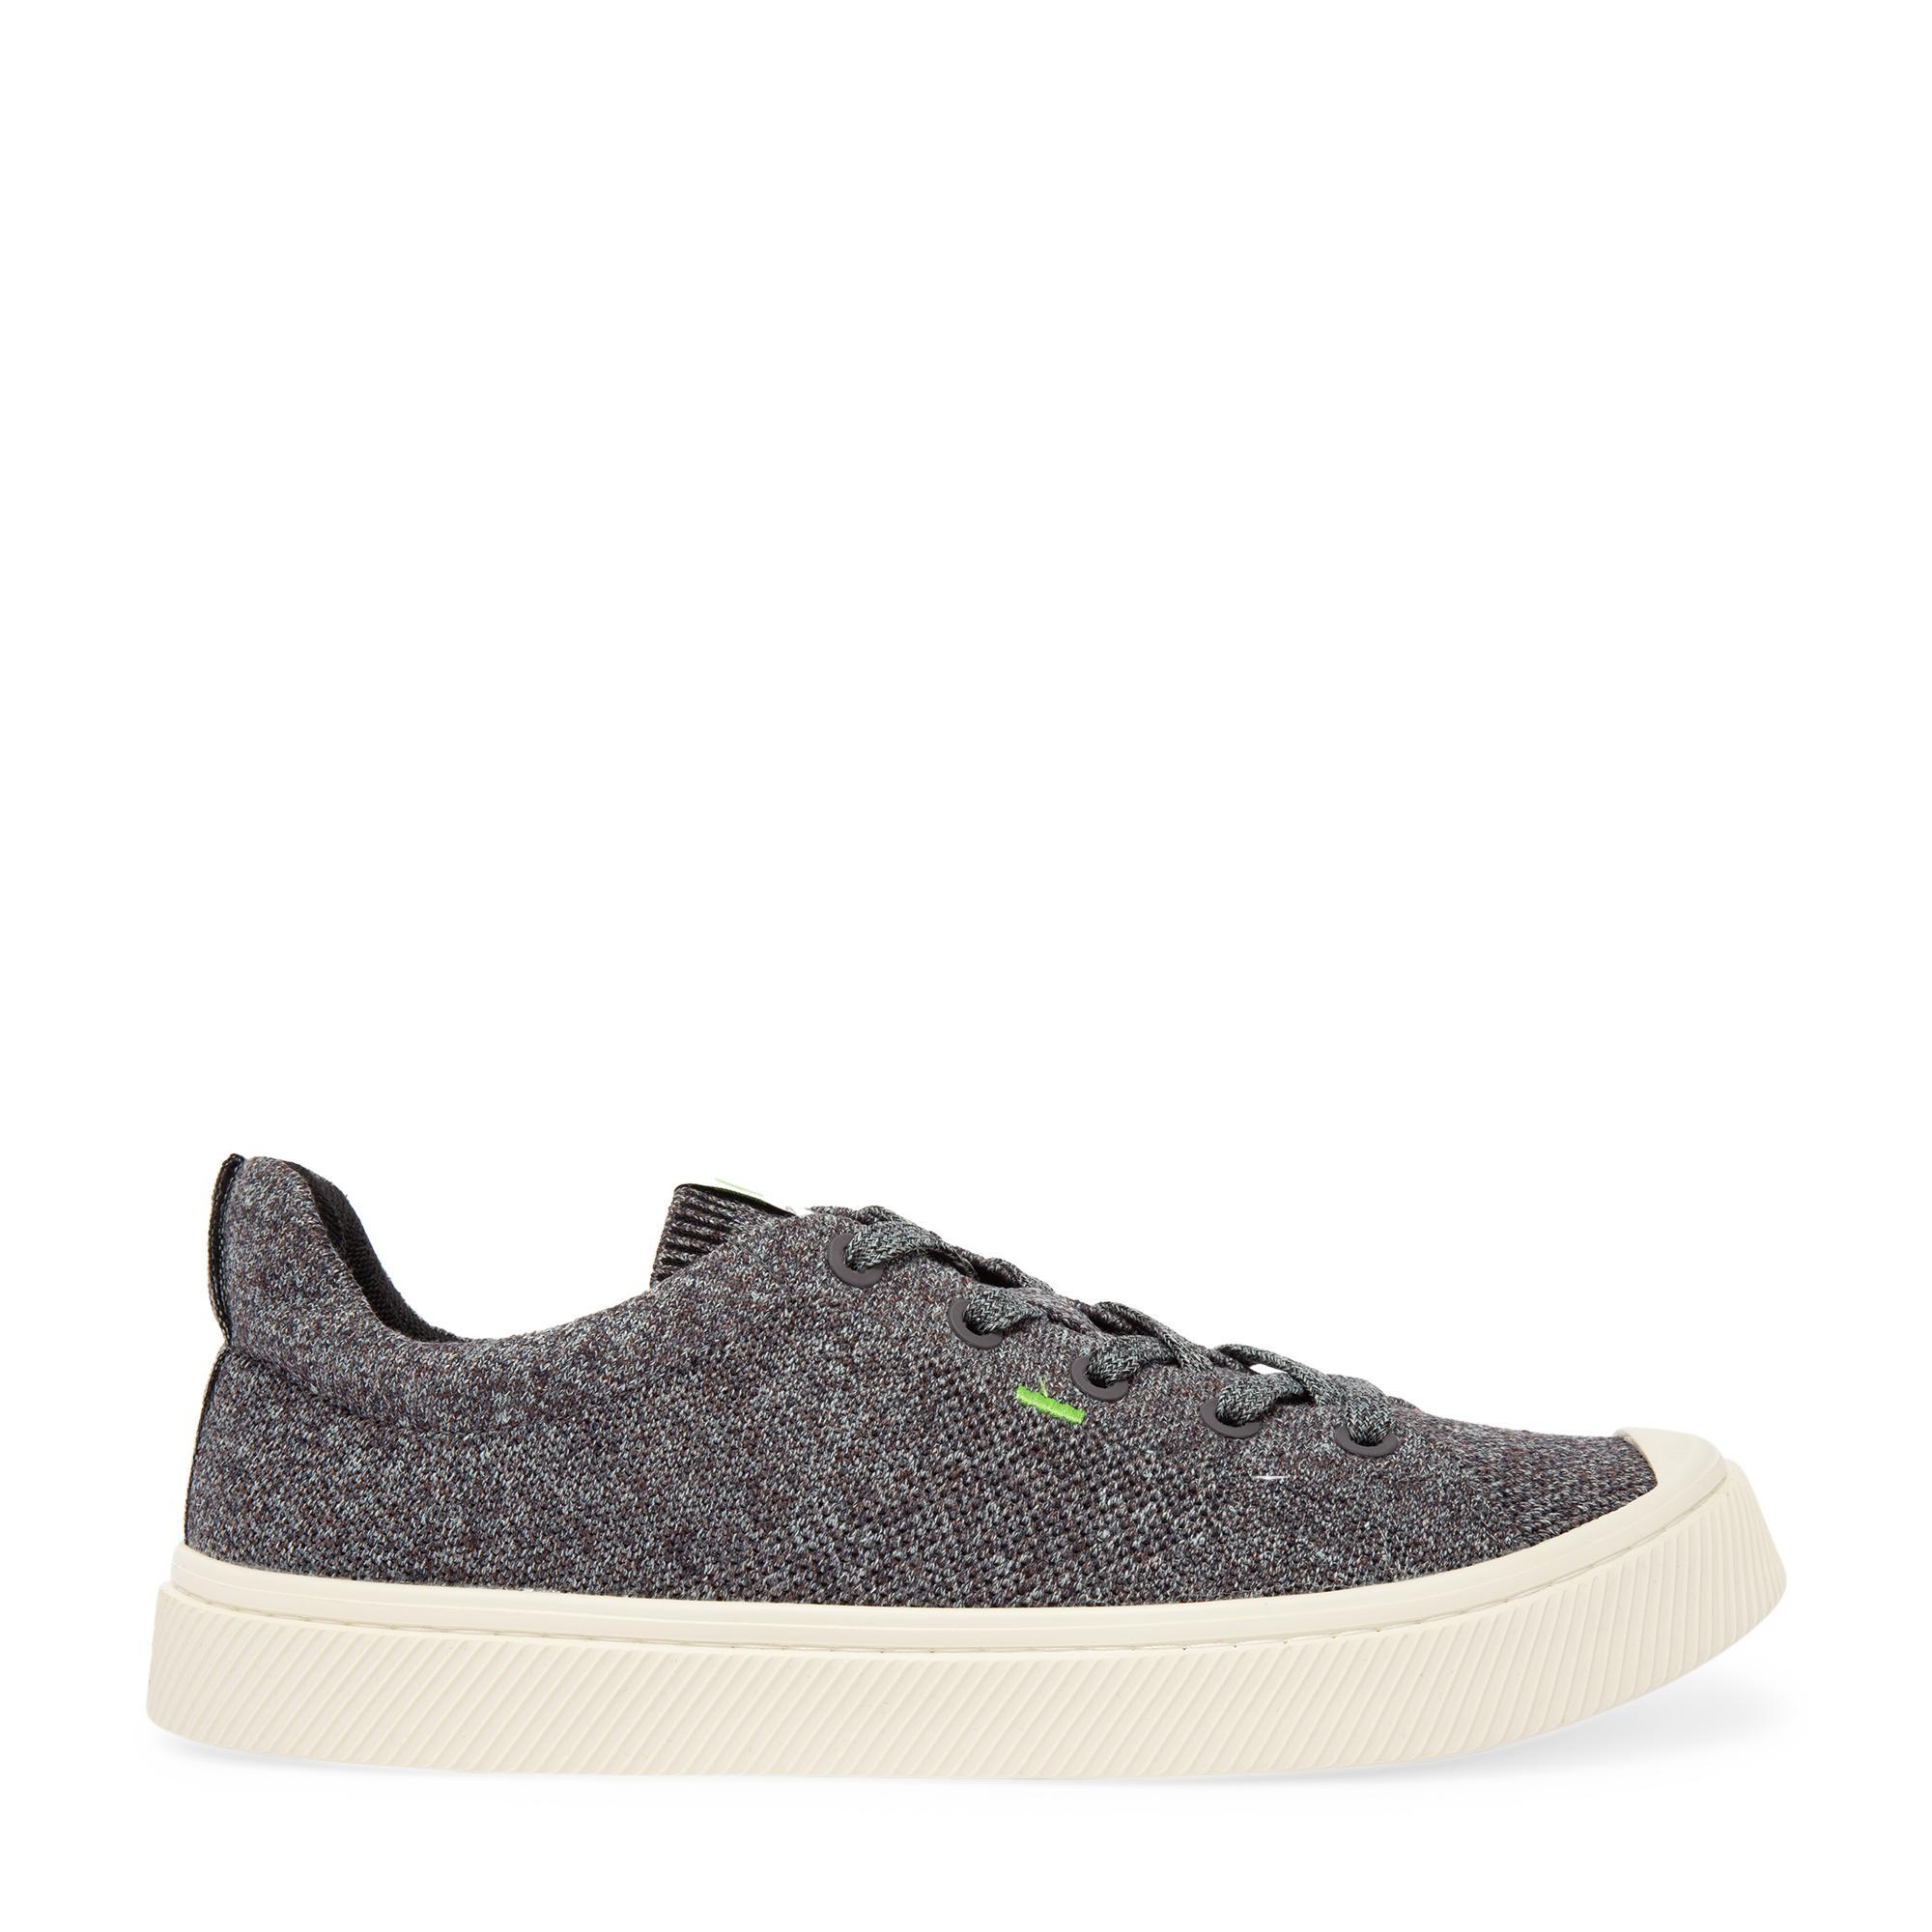 Ibi knit sneakers